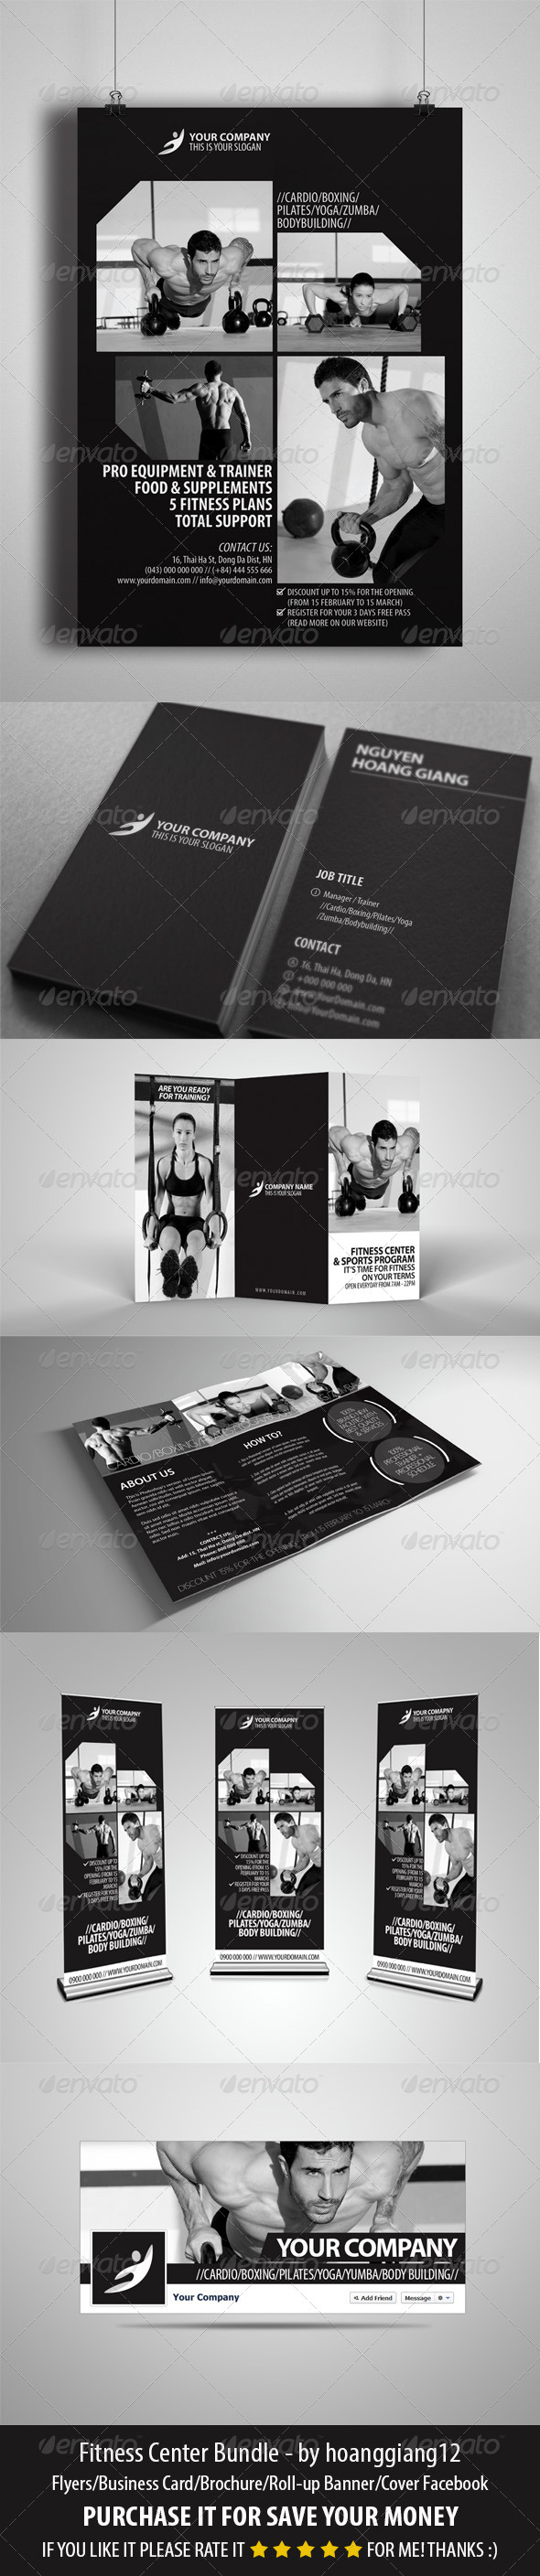 GraphicRiver Fitness Center Bundle 4302019